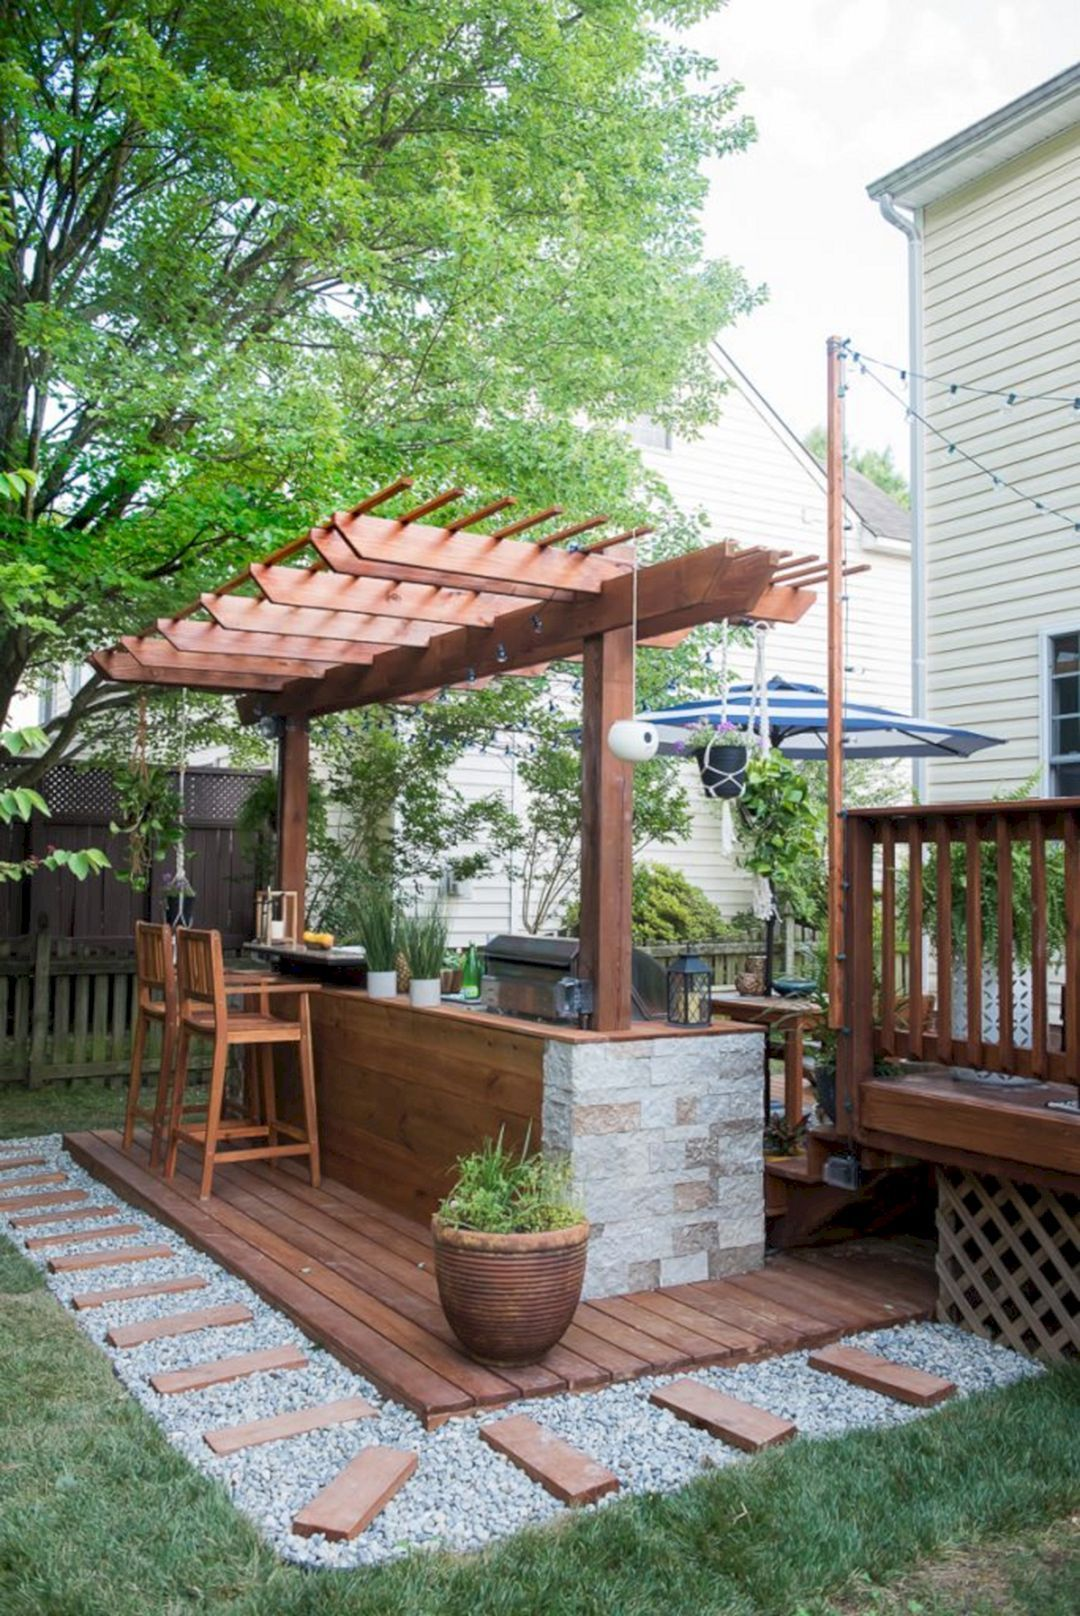 89 Incredible Outdoor Kitchen Design Ideas That Most Inspired 014 Decoor Outdoor Kitchen Design Diy Outdoor Kitchen Backyard Pergola